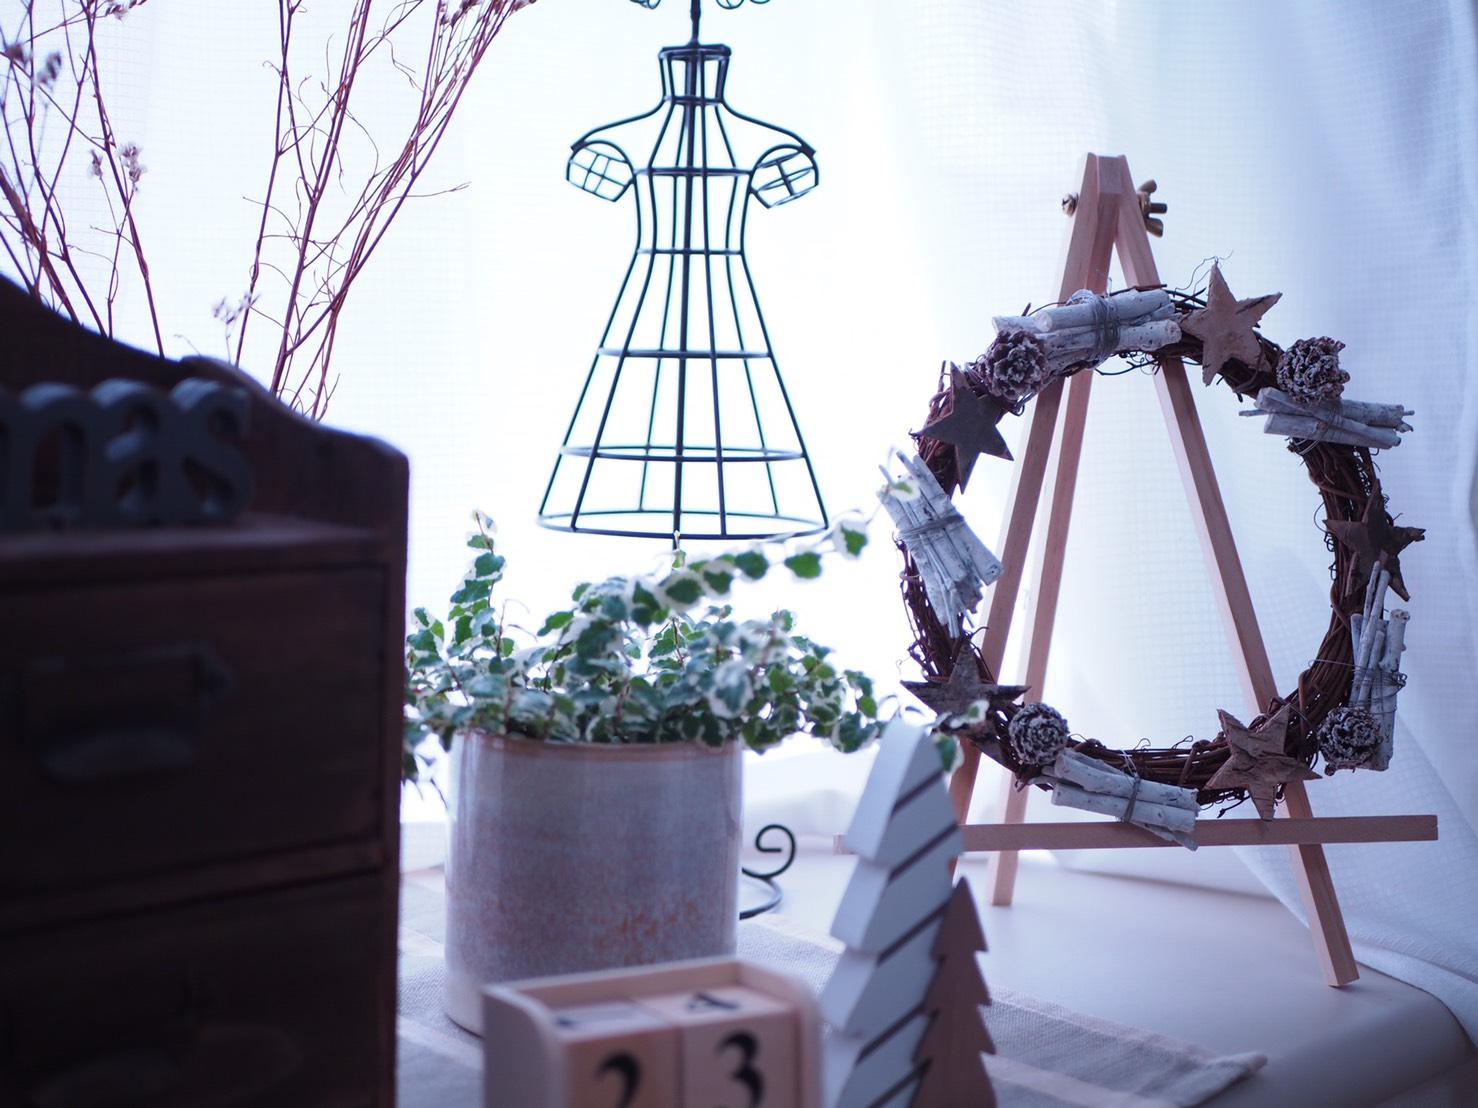 【#Seria】可愛すぎるセリアの新作itemでクリスマスムードを楽しむ♡_8